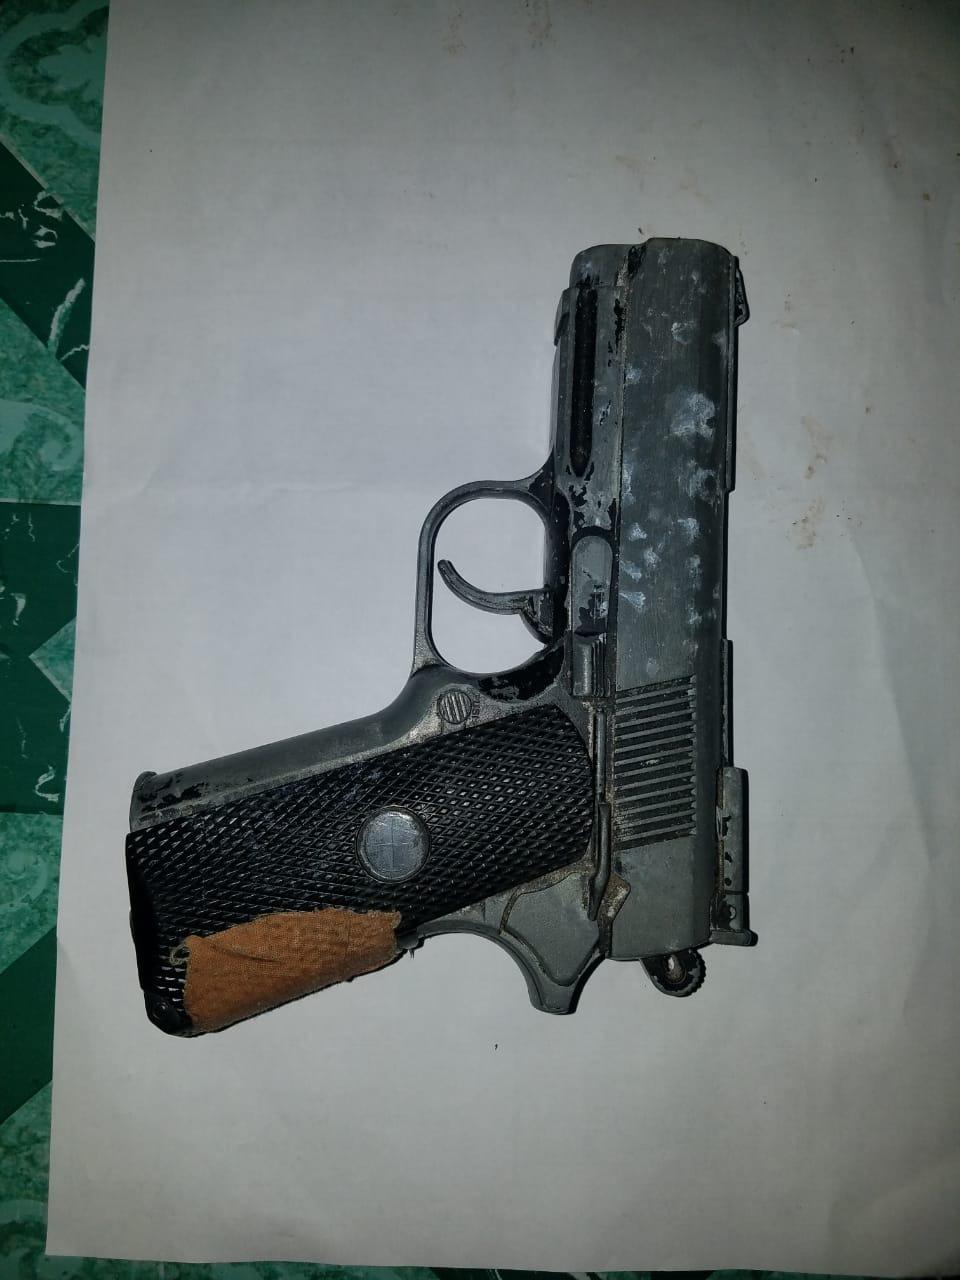 Two arrested for illegal gun, ganja possession